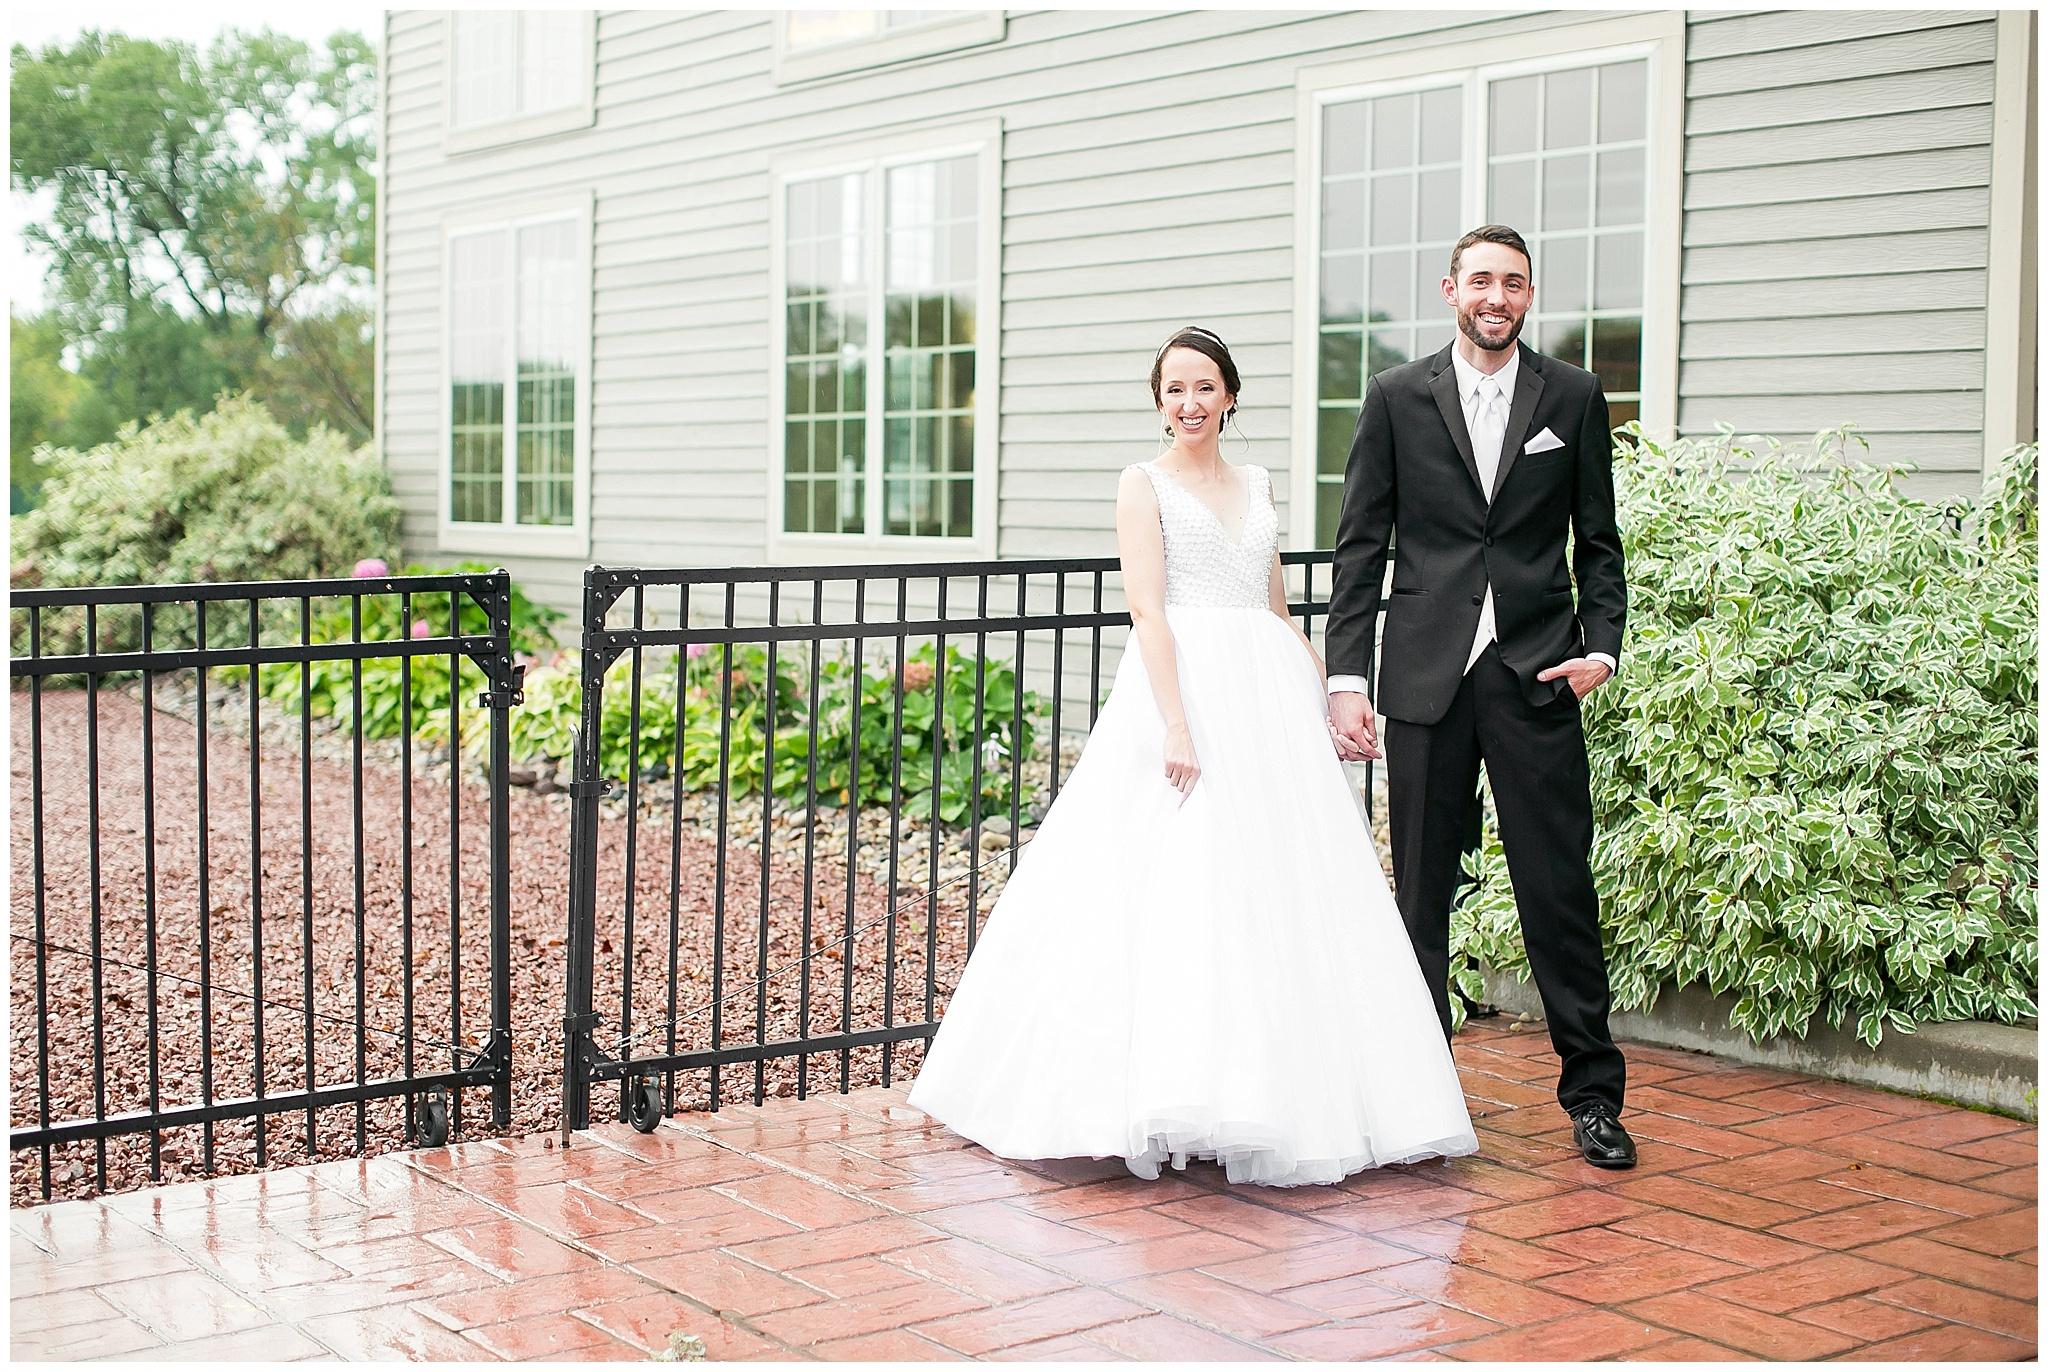 bridgewood_resort_wedding_neenah_wisconsin_0349.jpg